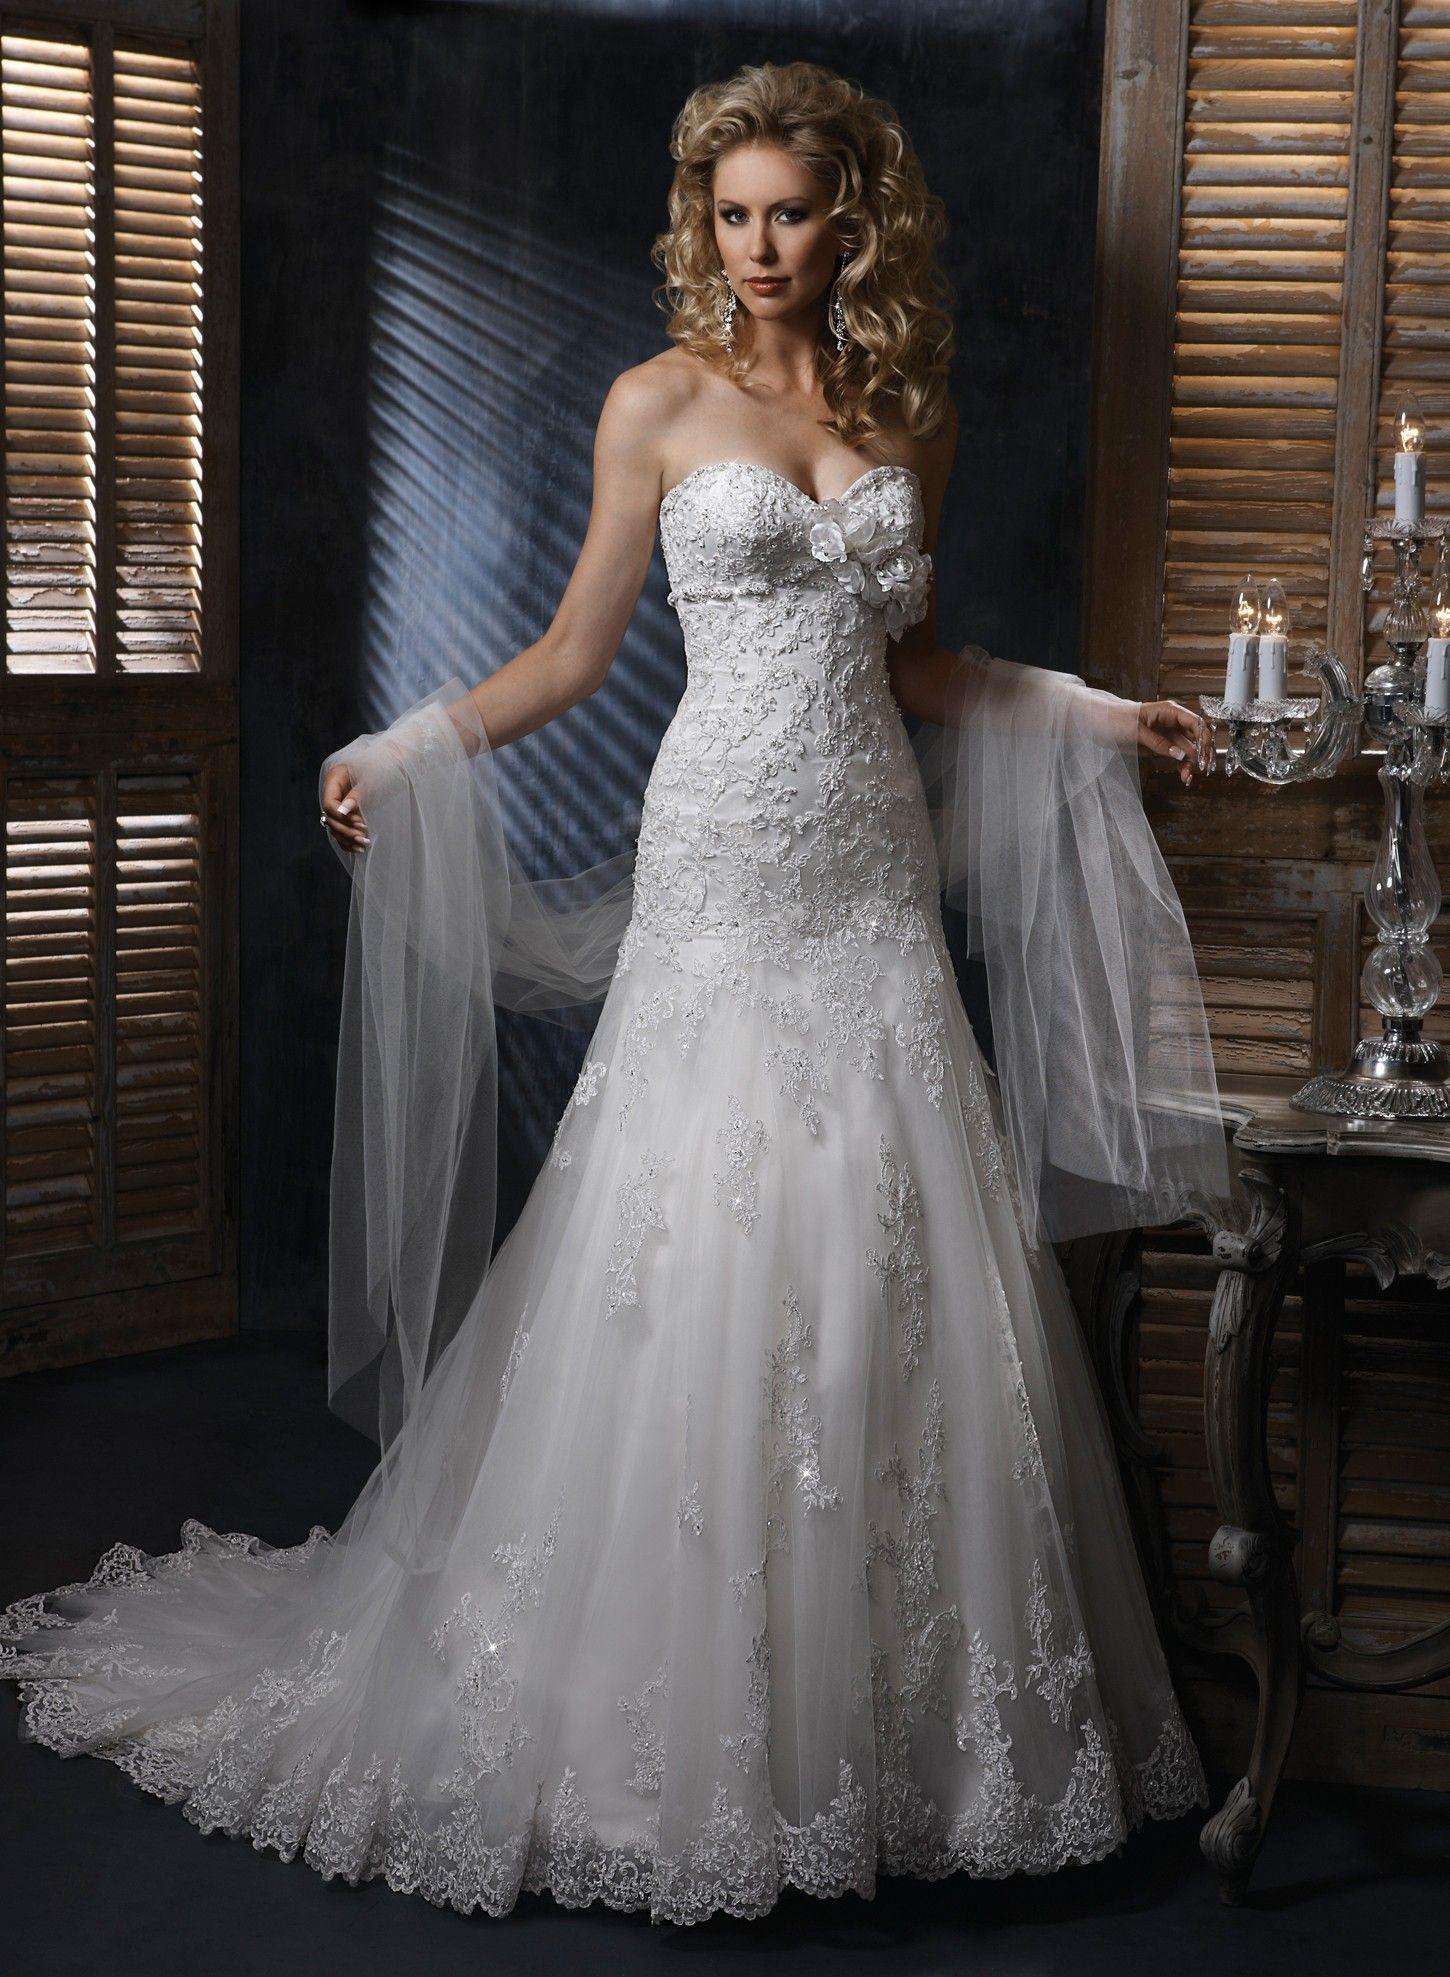 Lace Sweetheart Strapless Neckline A line Wedding Dress